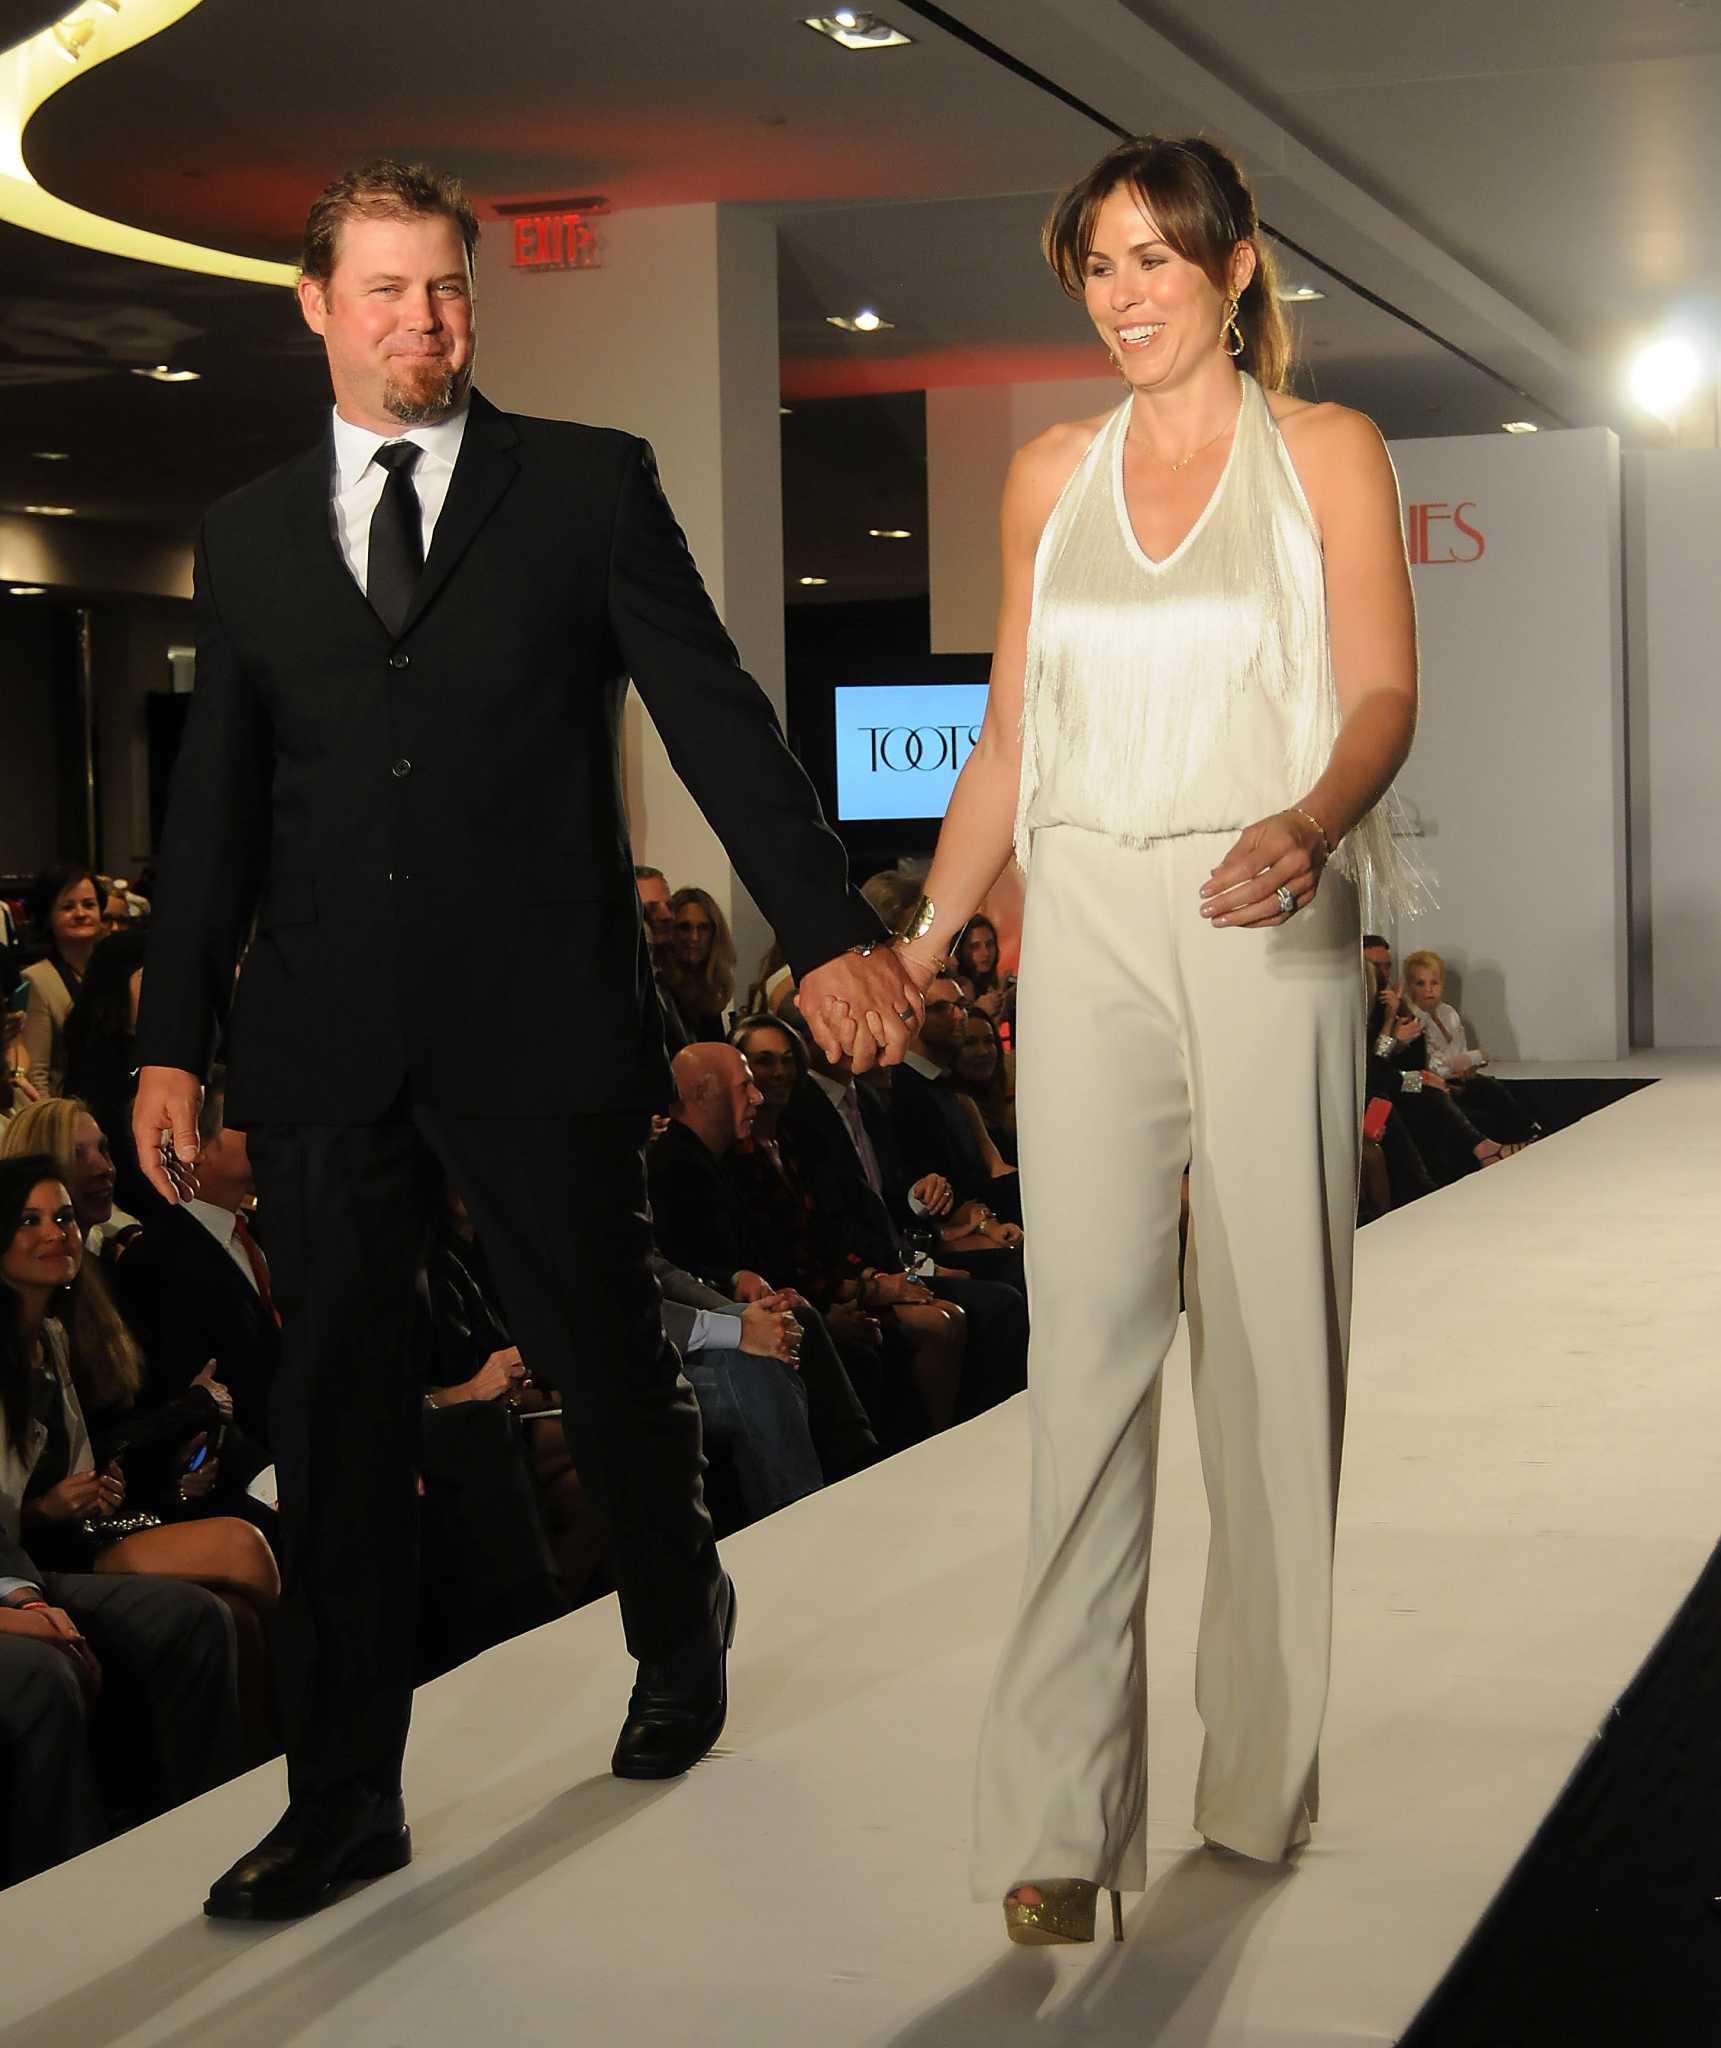 Erin Lechler Has Always Been At Her Husbands Side